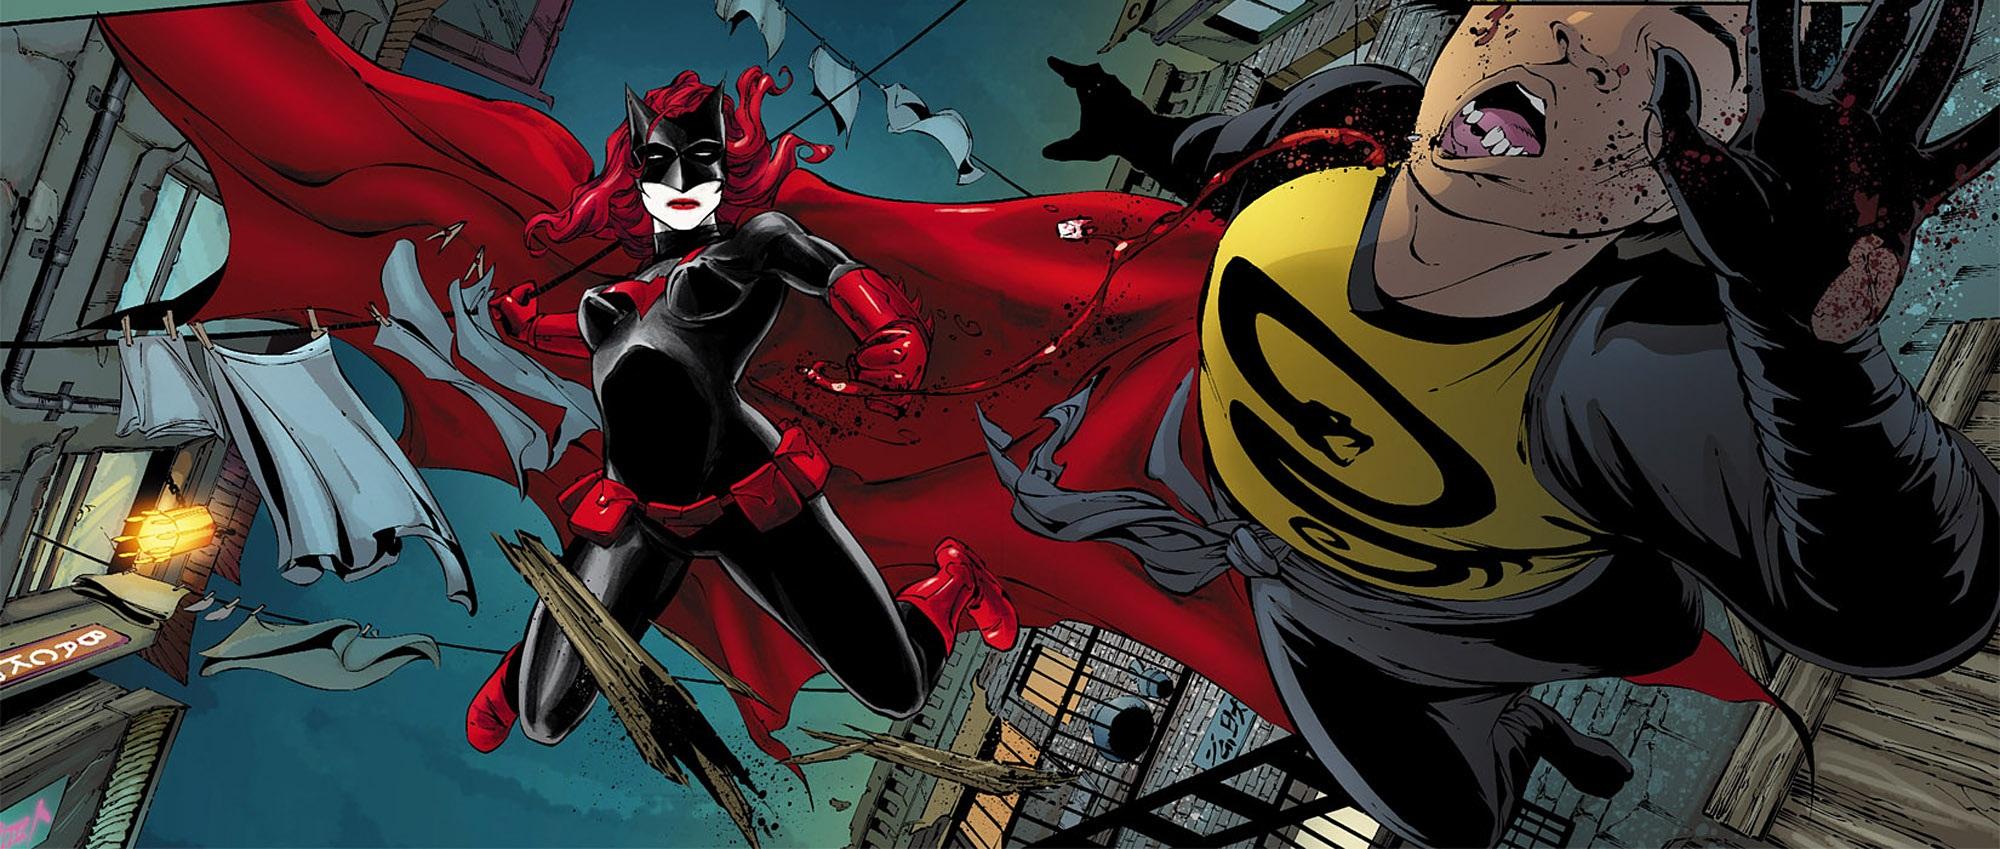 Batwoman 0008.jpg